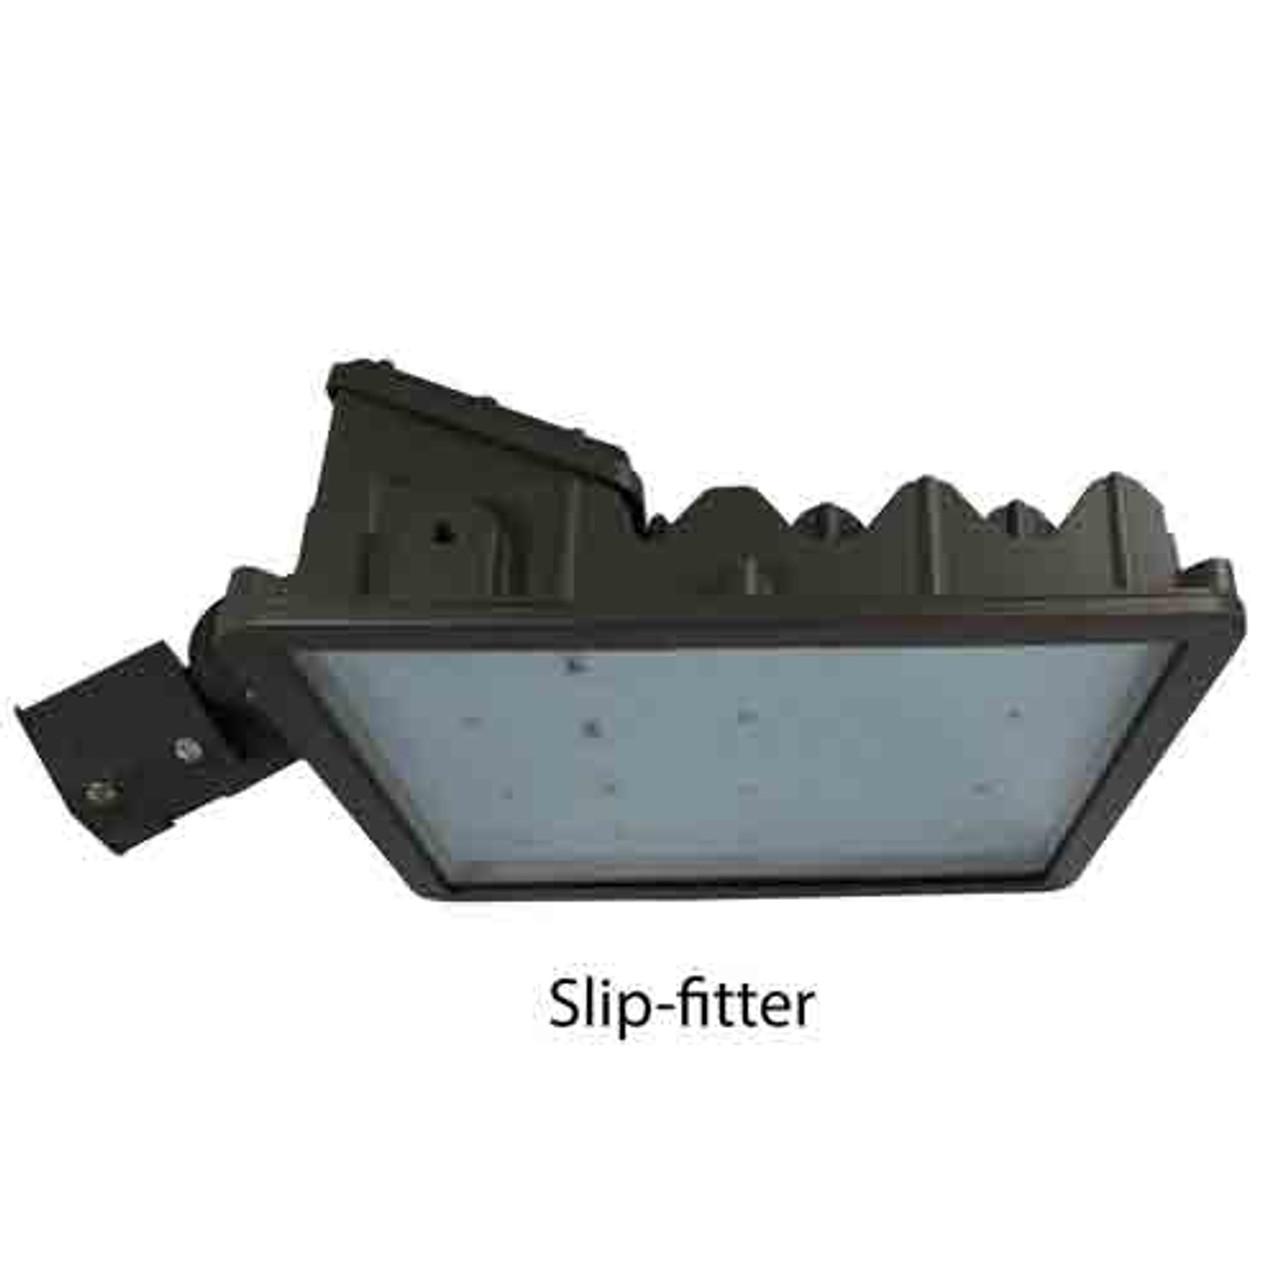 175 Watt LED Area Light 16,964 Lumens with Slip-fitter